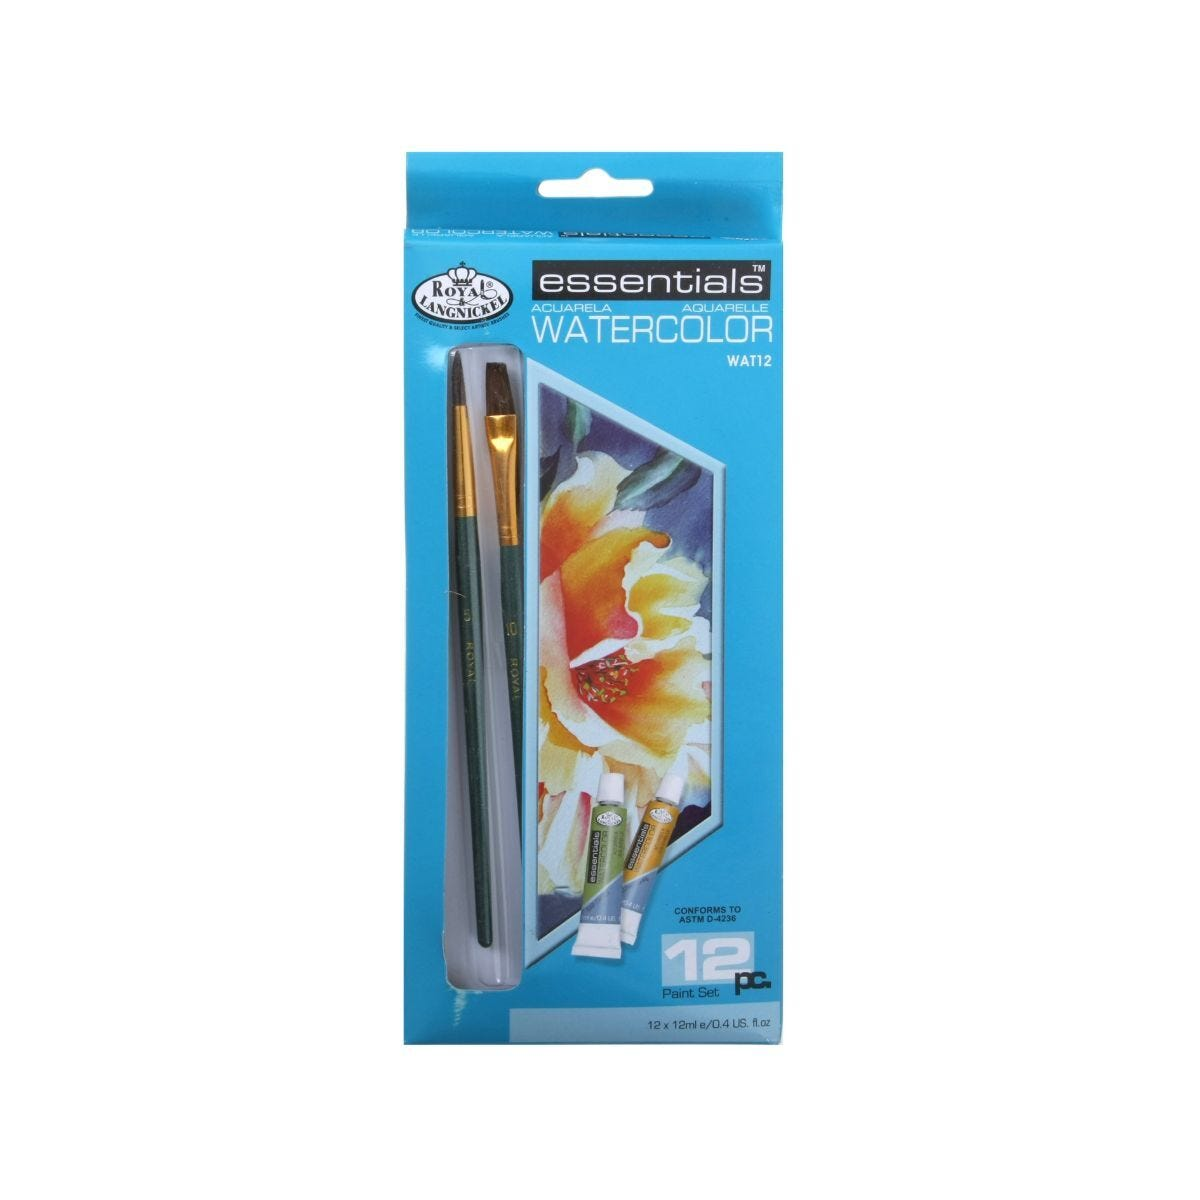 Royal & Langnickel Watercolour Set Pack of 12